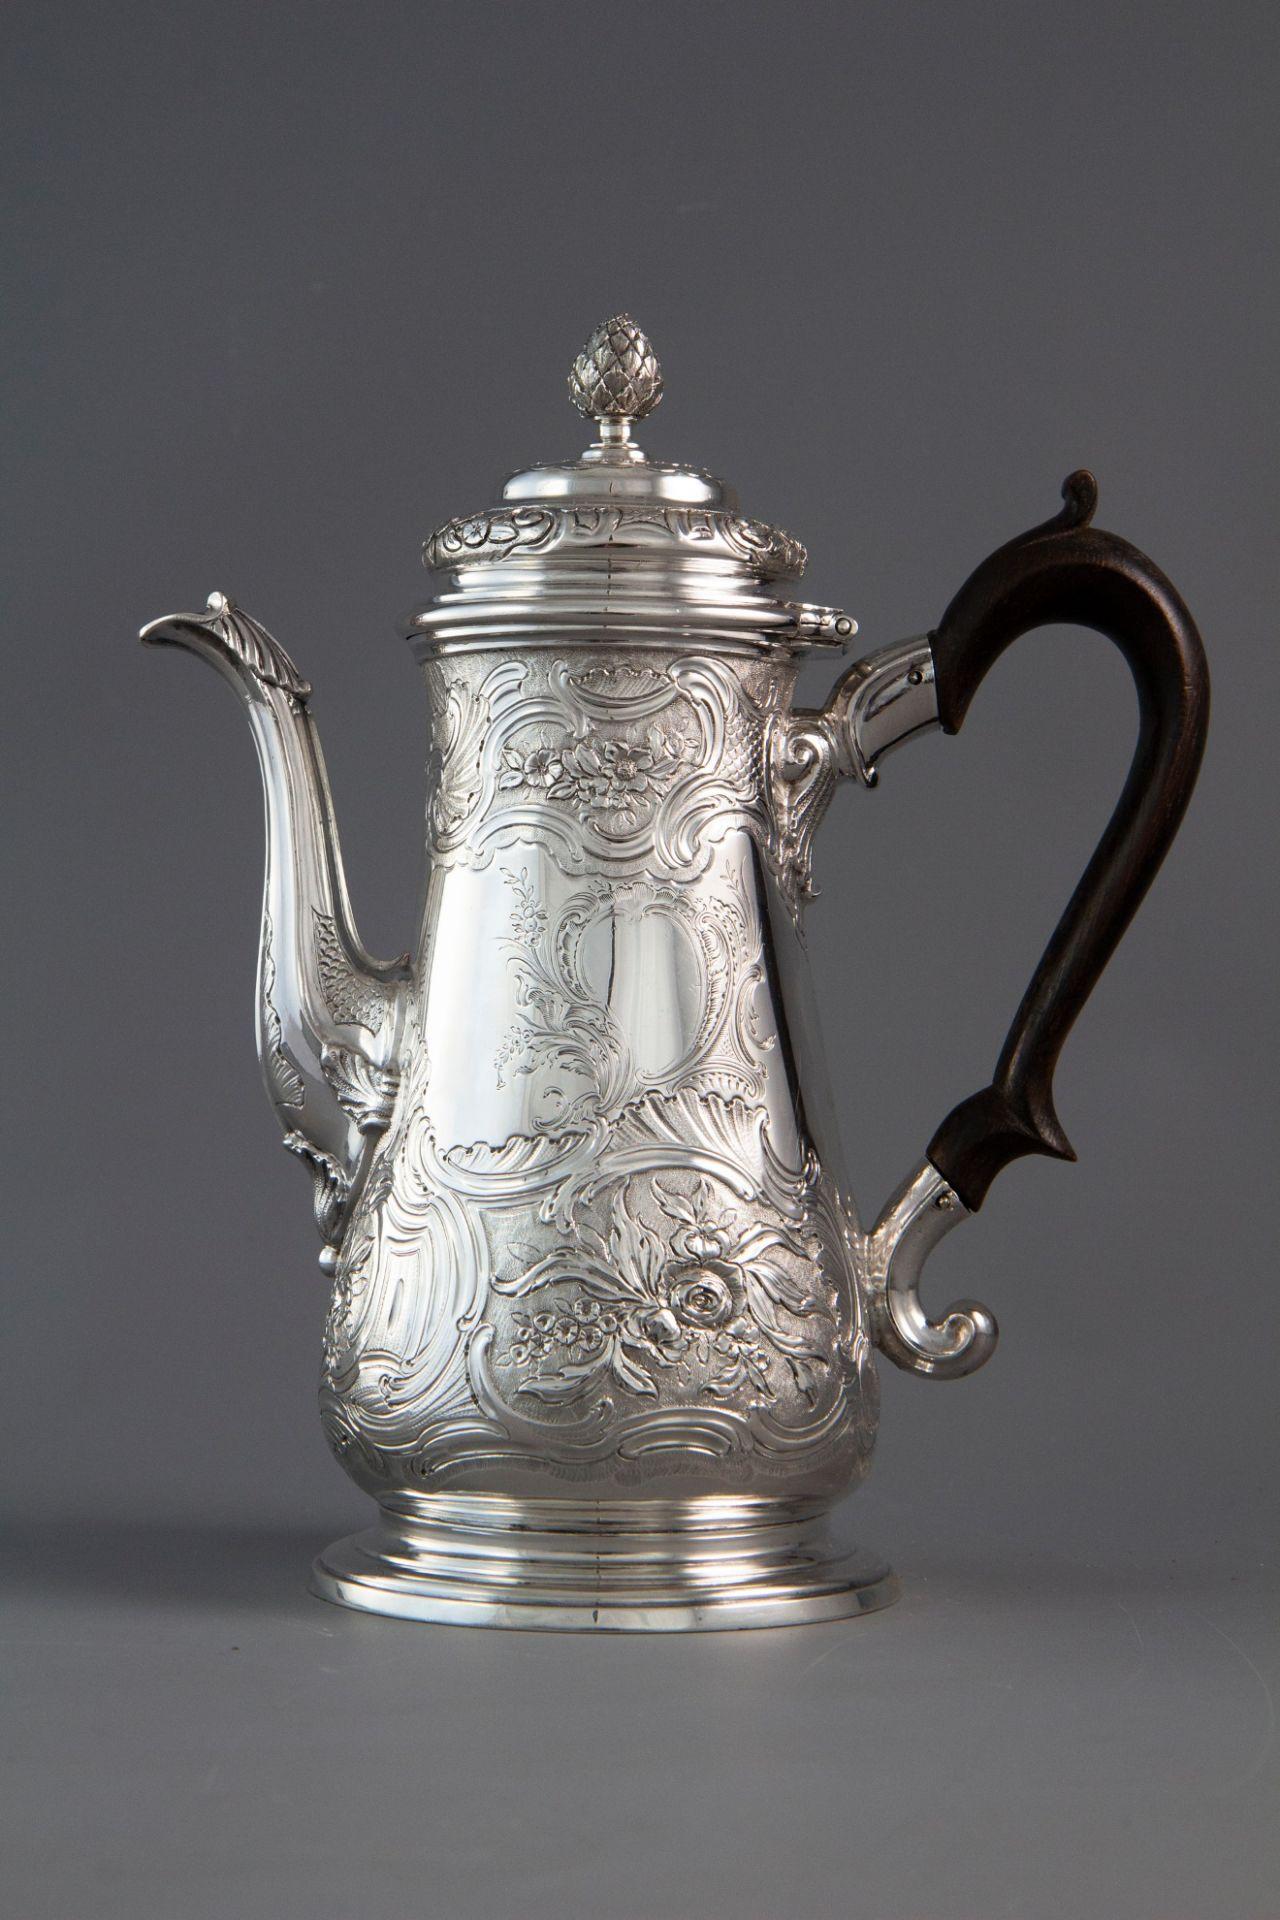 A Very Fine George II Silver Coffee Pot London 1743 by Gabriel Sleath